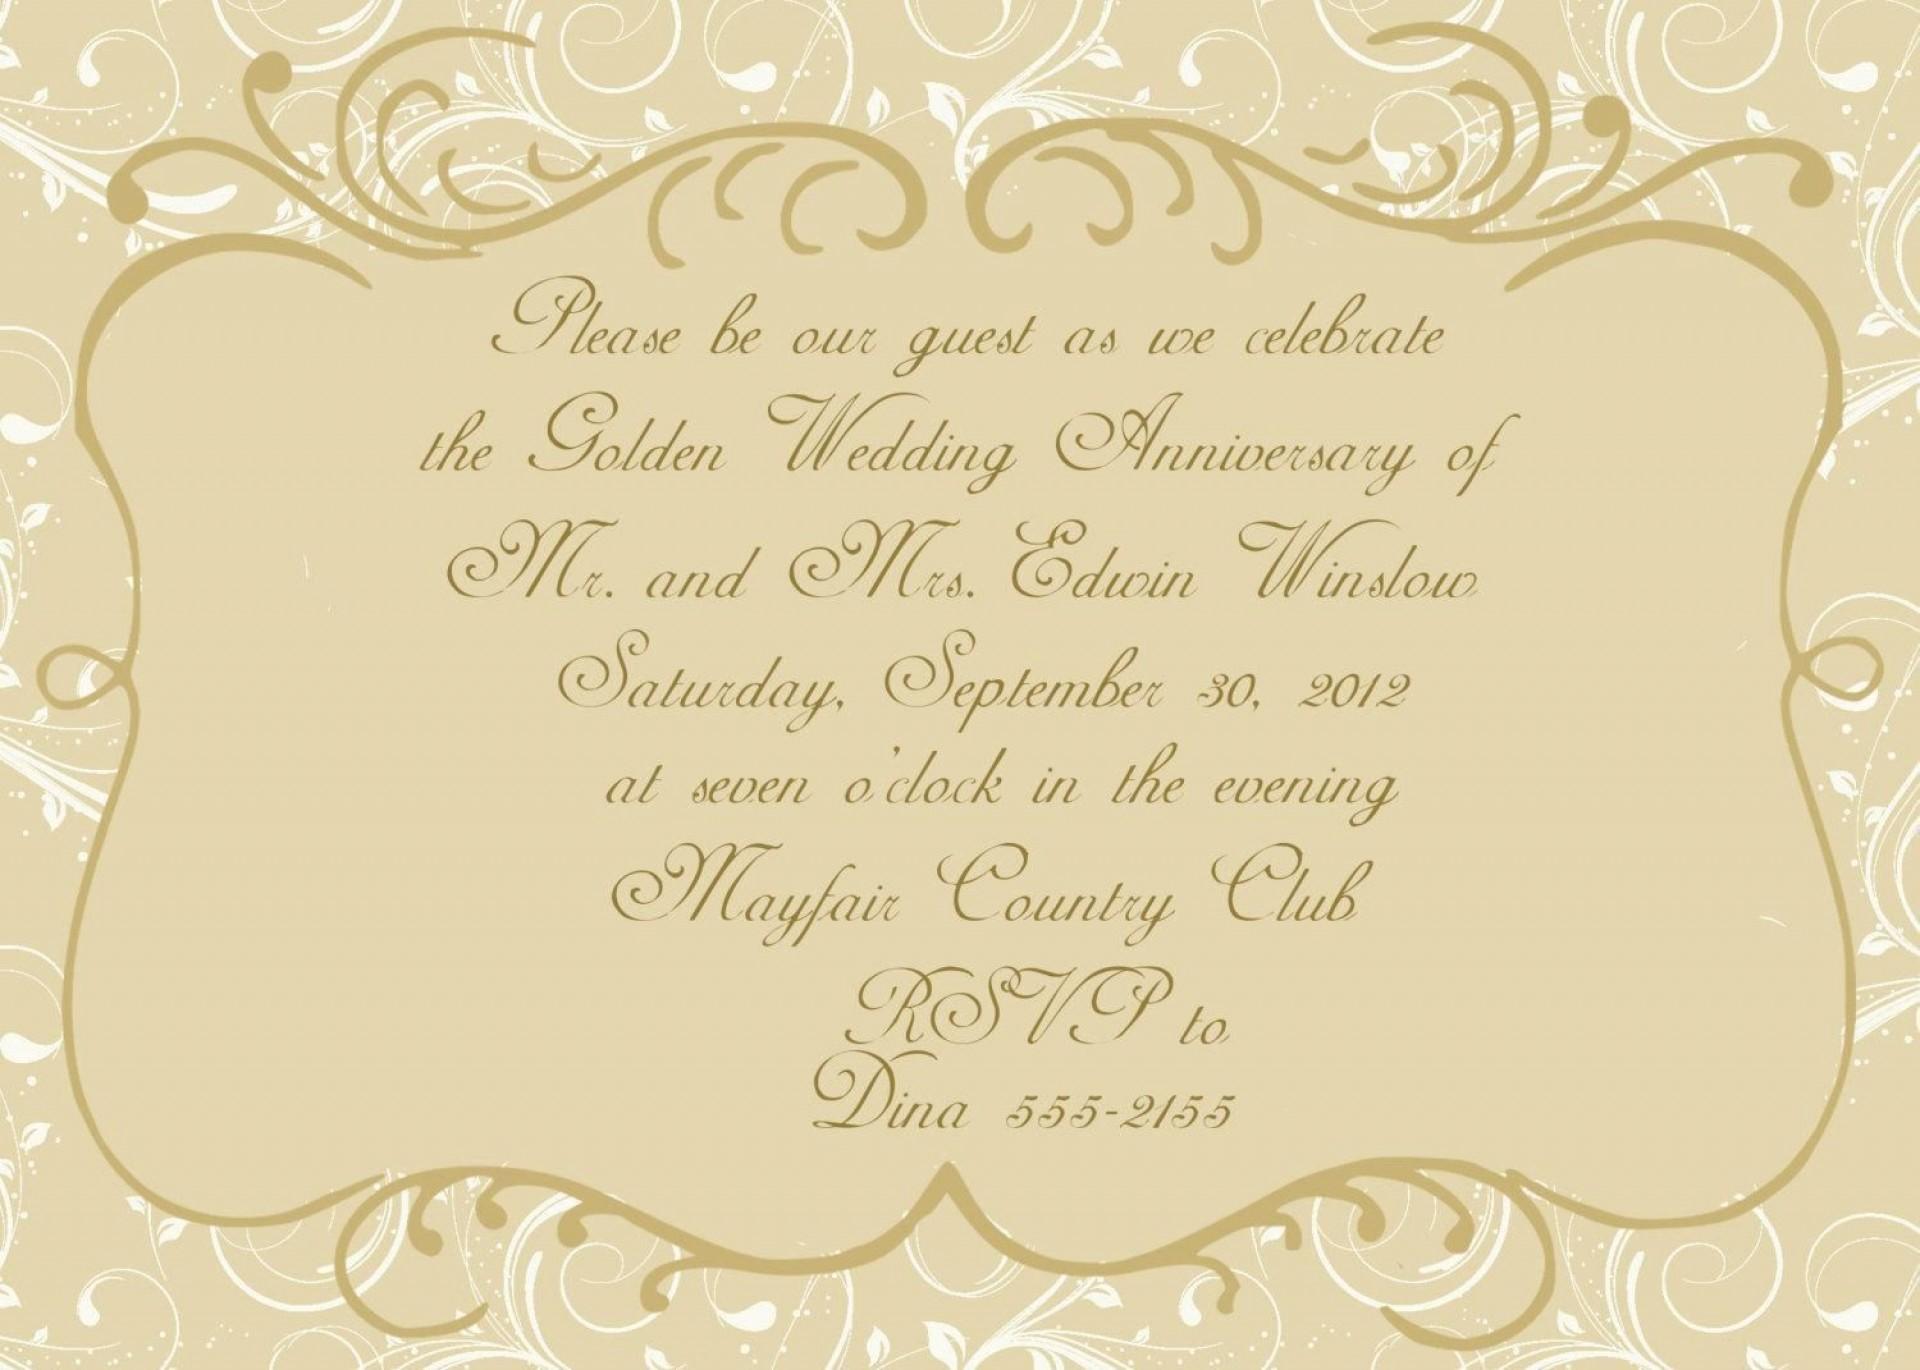 004 Stunning 50th Anniversary Invitation Card Template Inspiration  Templates Free1920